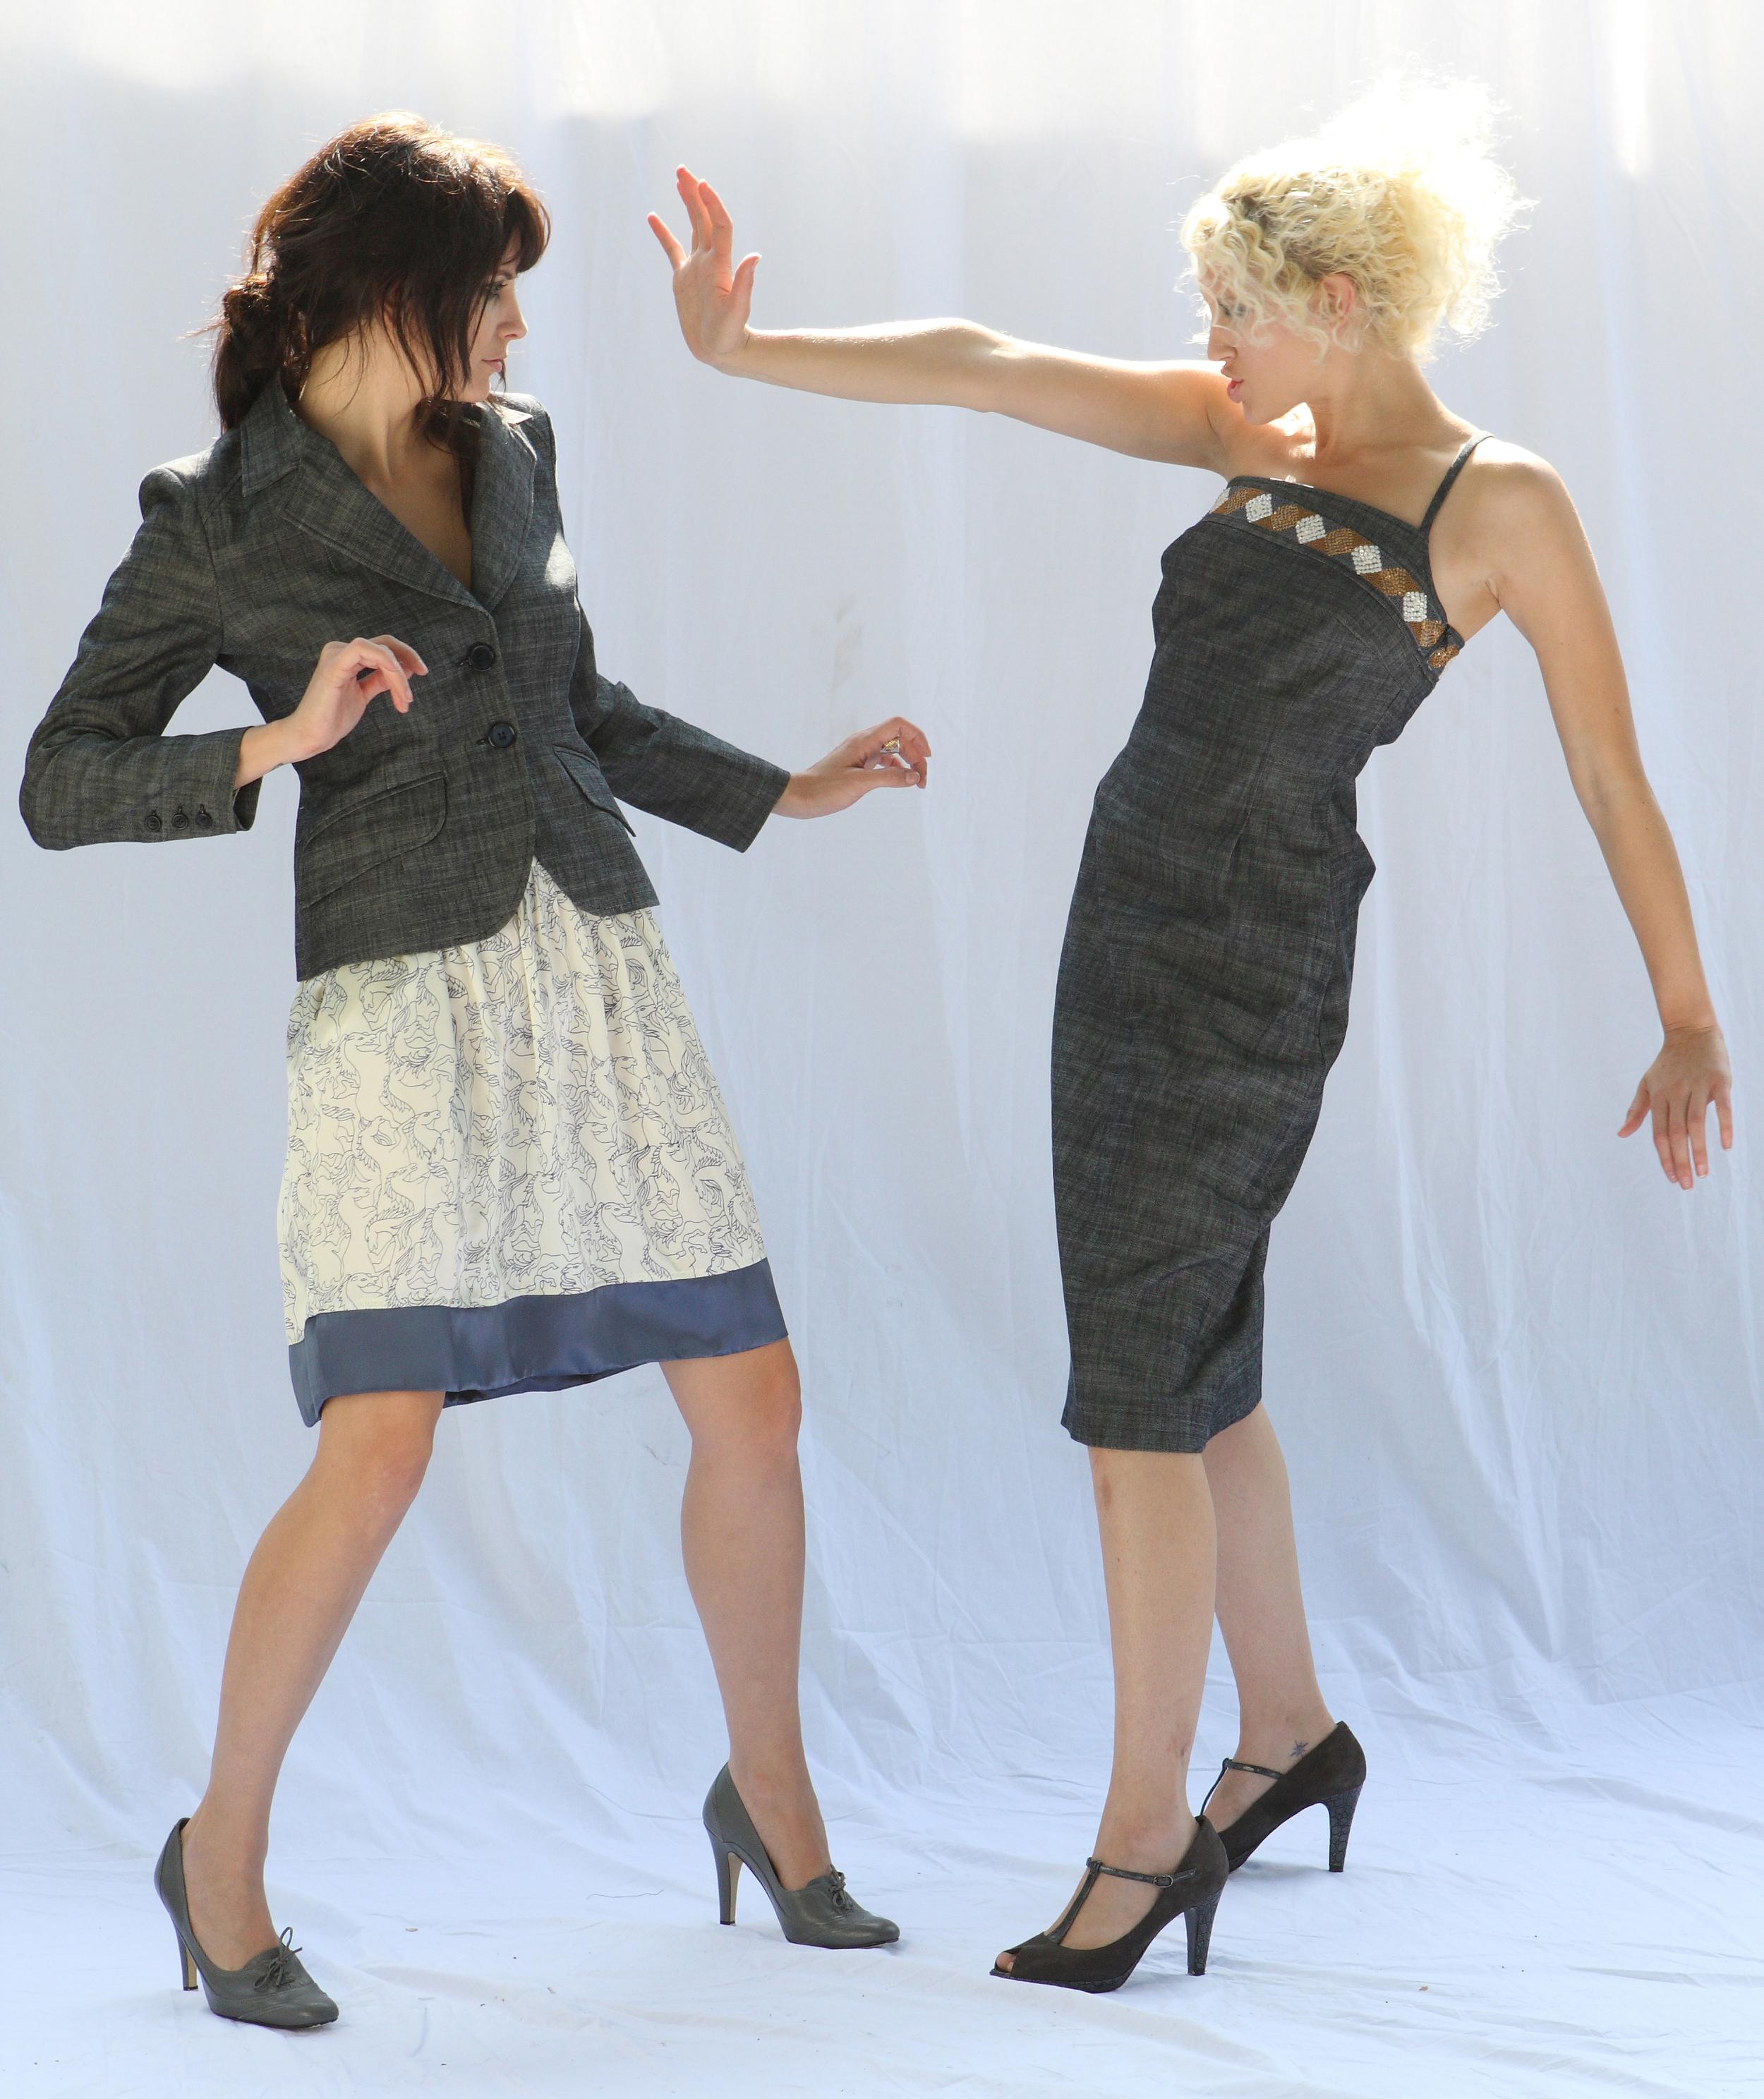 Shrunken Blazer in Italian Charcol Stetch Denim.  Quilt Waist Full Skirt w/ Pockets in Horse Print Silk Charmeuse.  On right:  Asymetric Single Strap Bodice Dress in Italian Charcol Stretch Denim w/ Beaded Top Band.